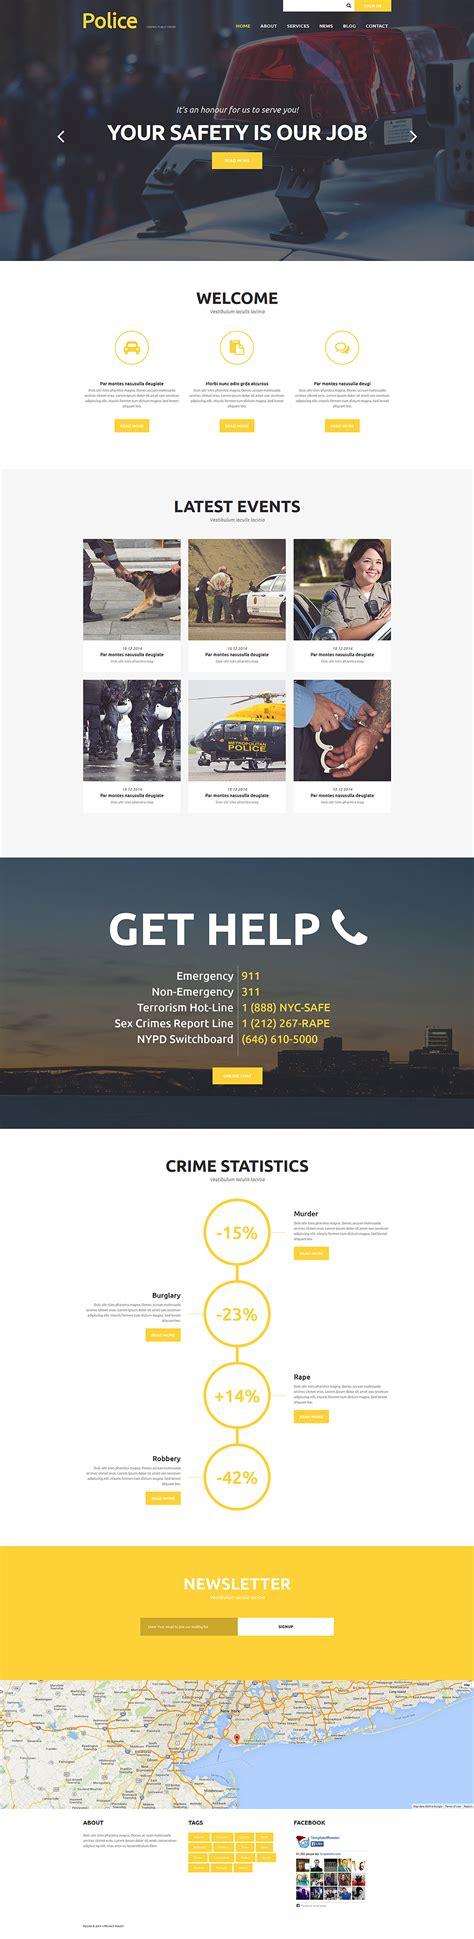 template joomla newsletter police department joomla theme